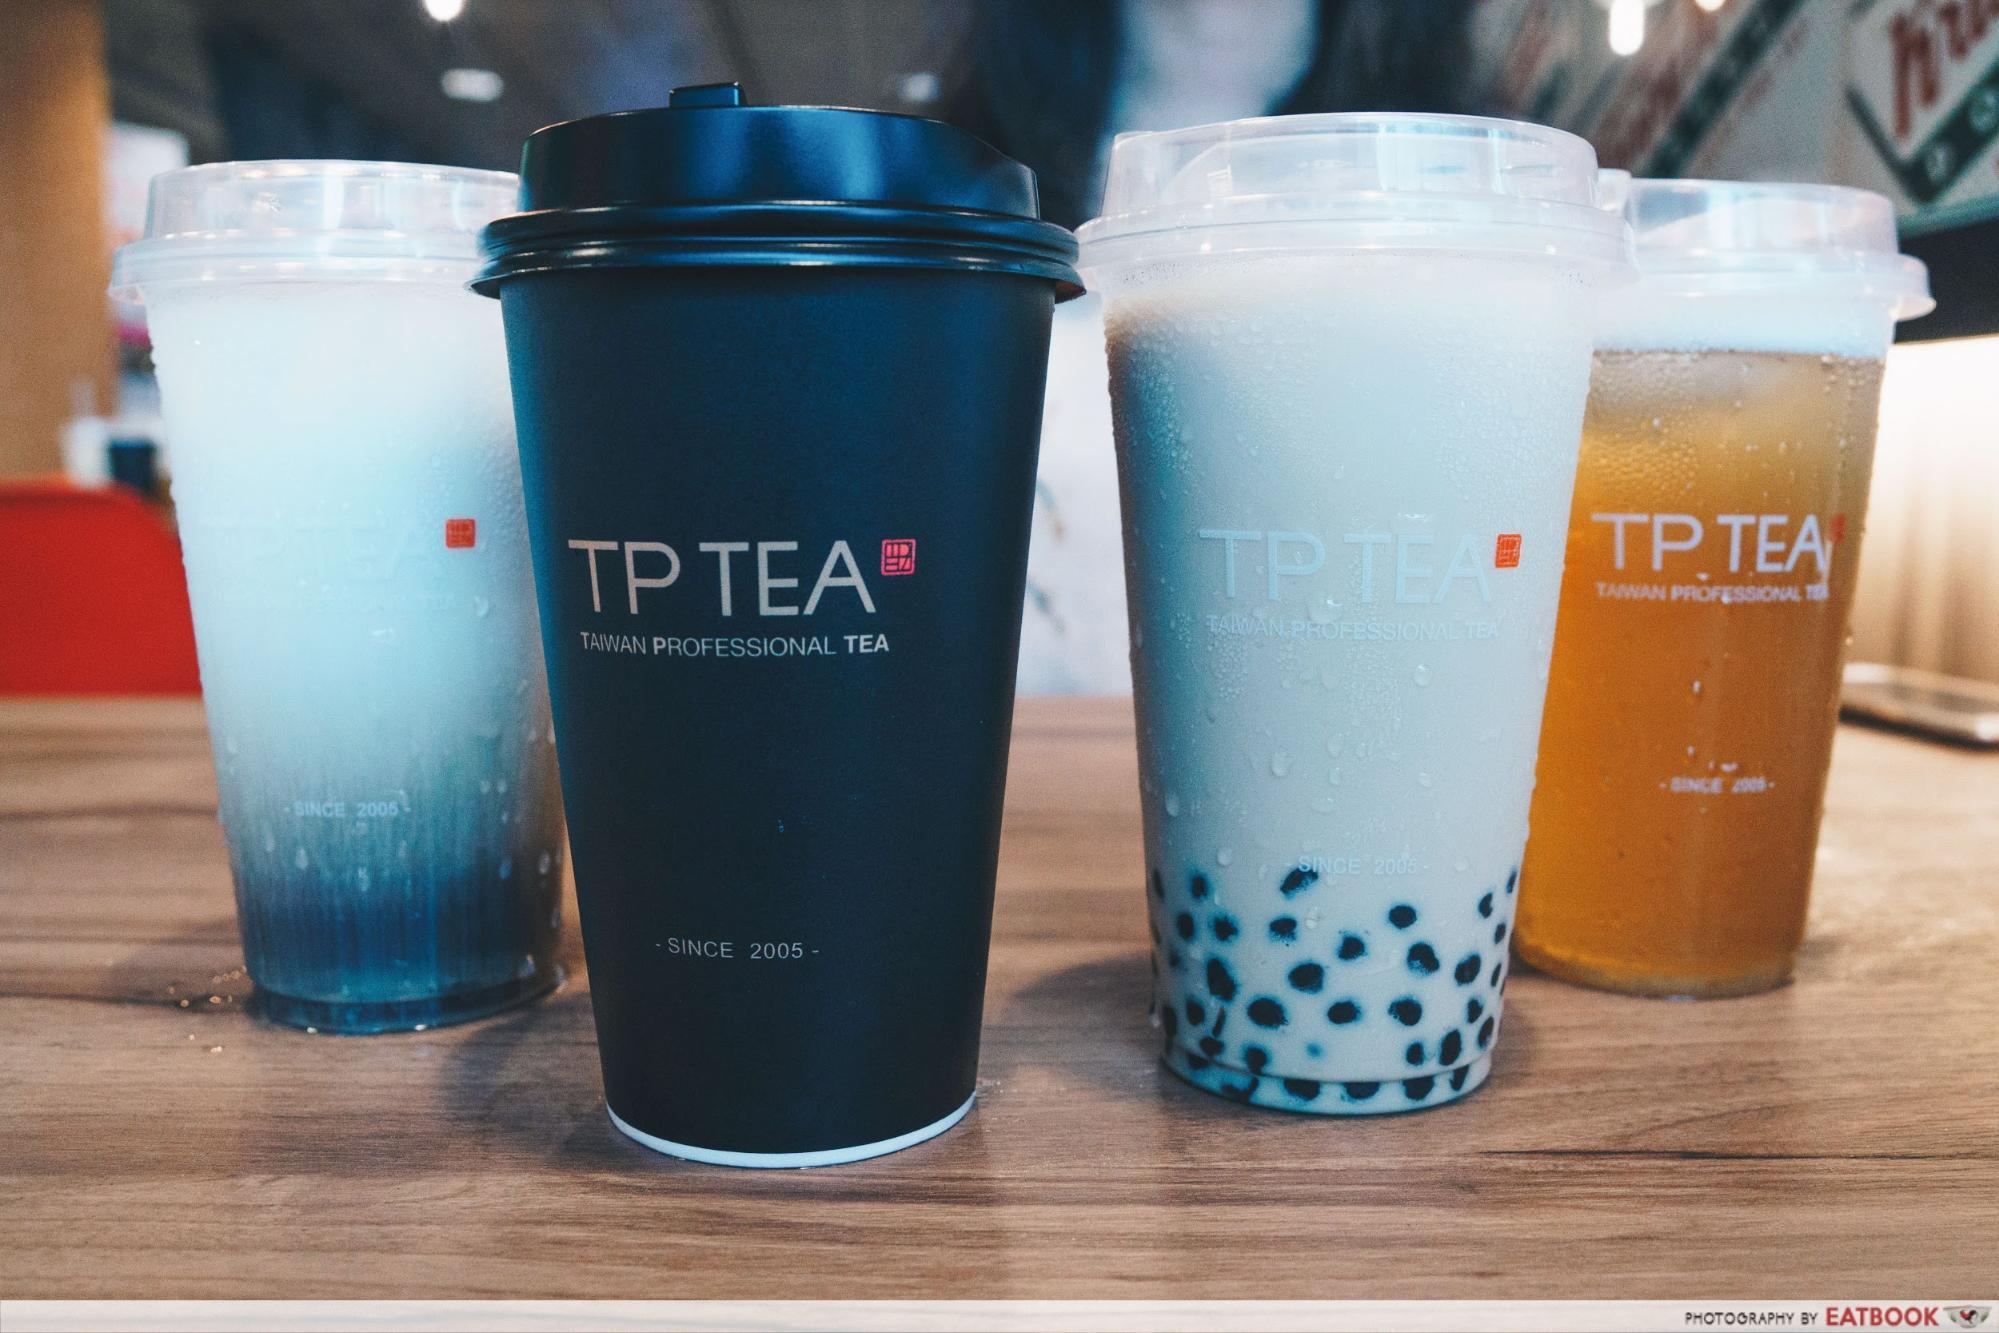 TP Tea - Variety